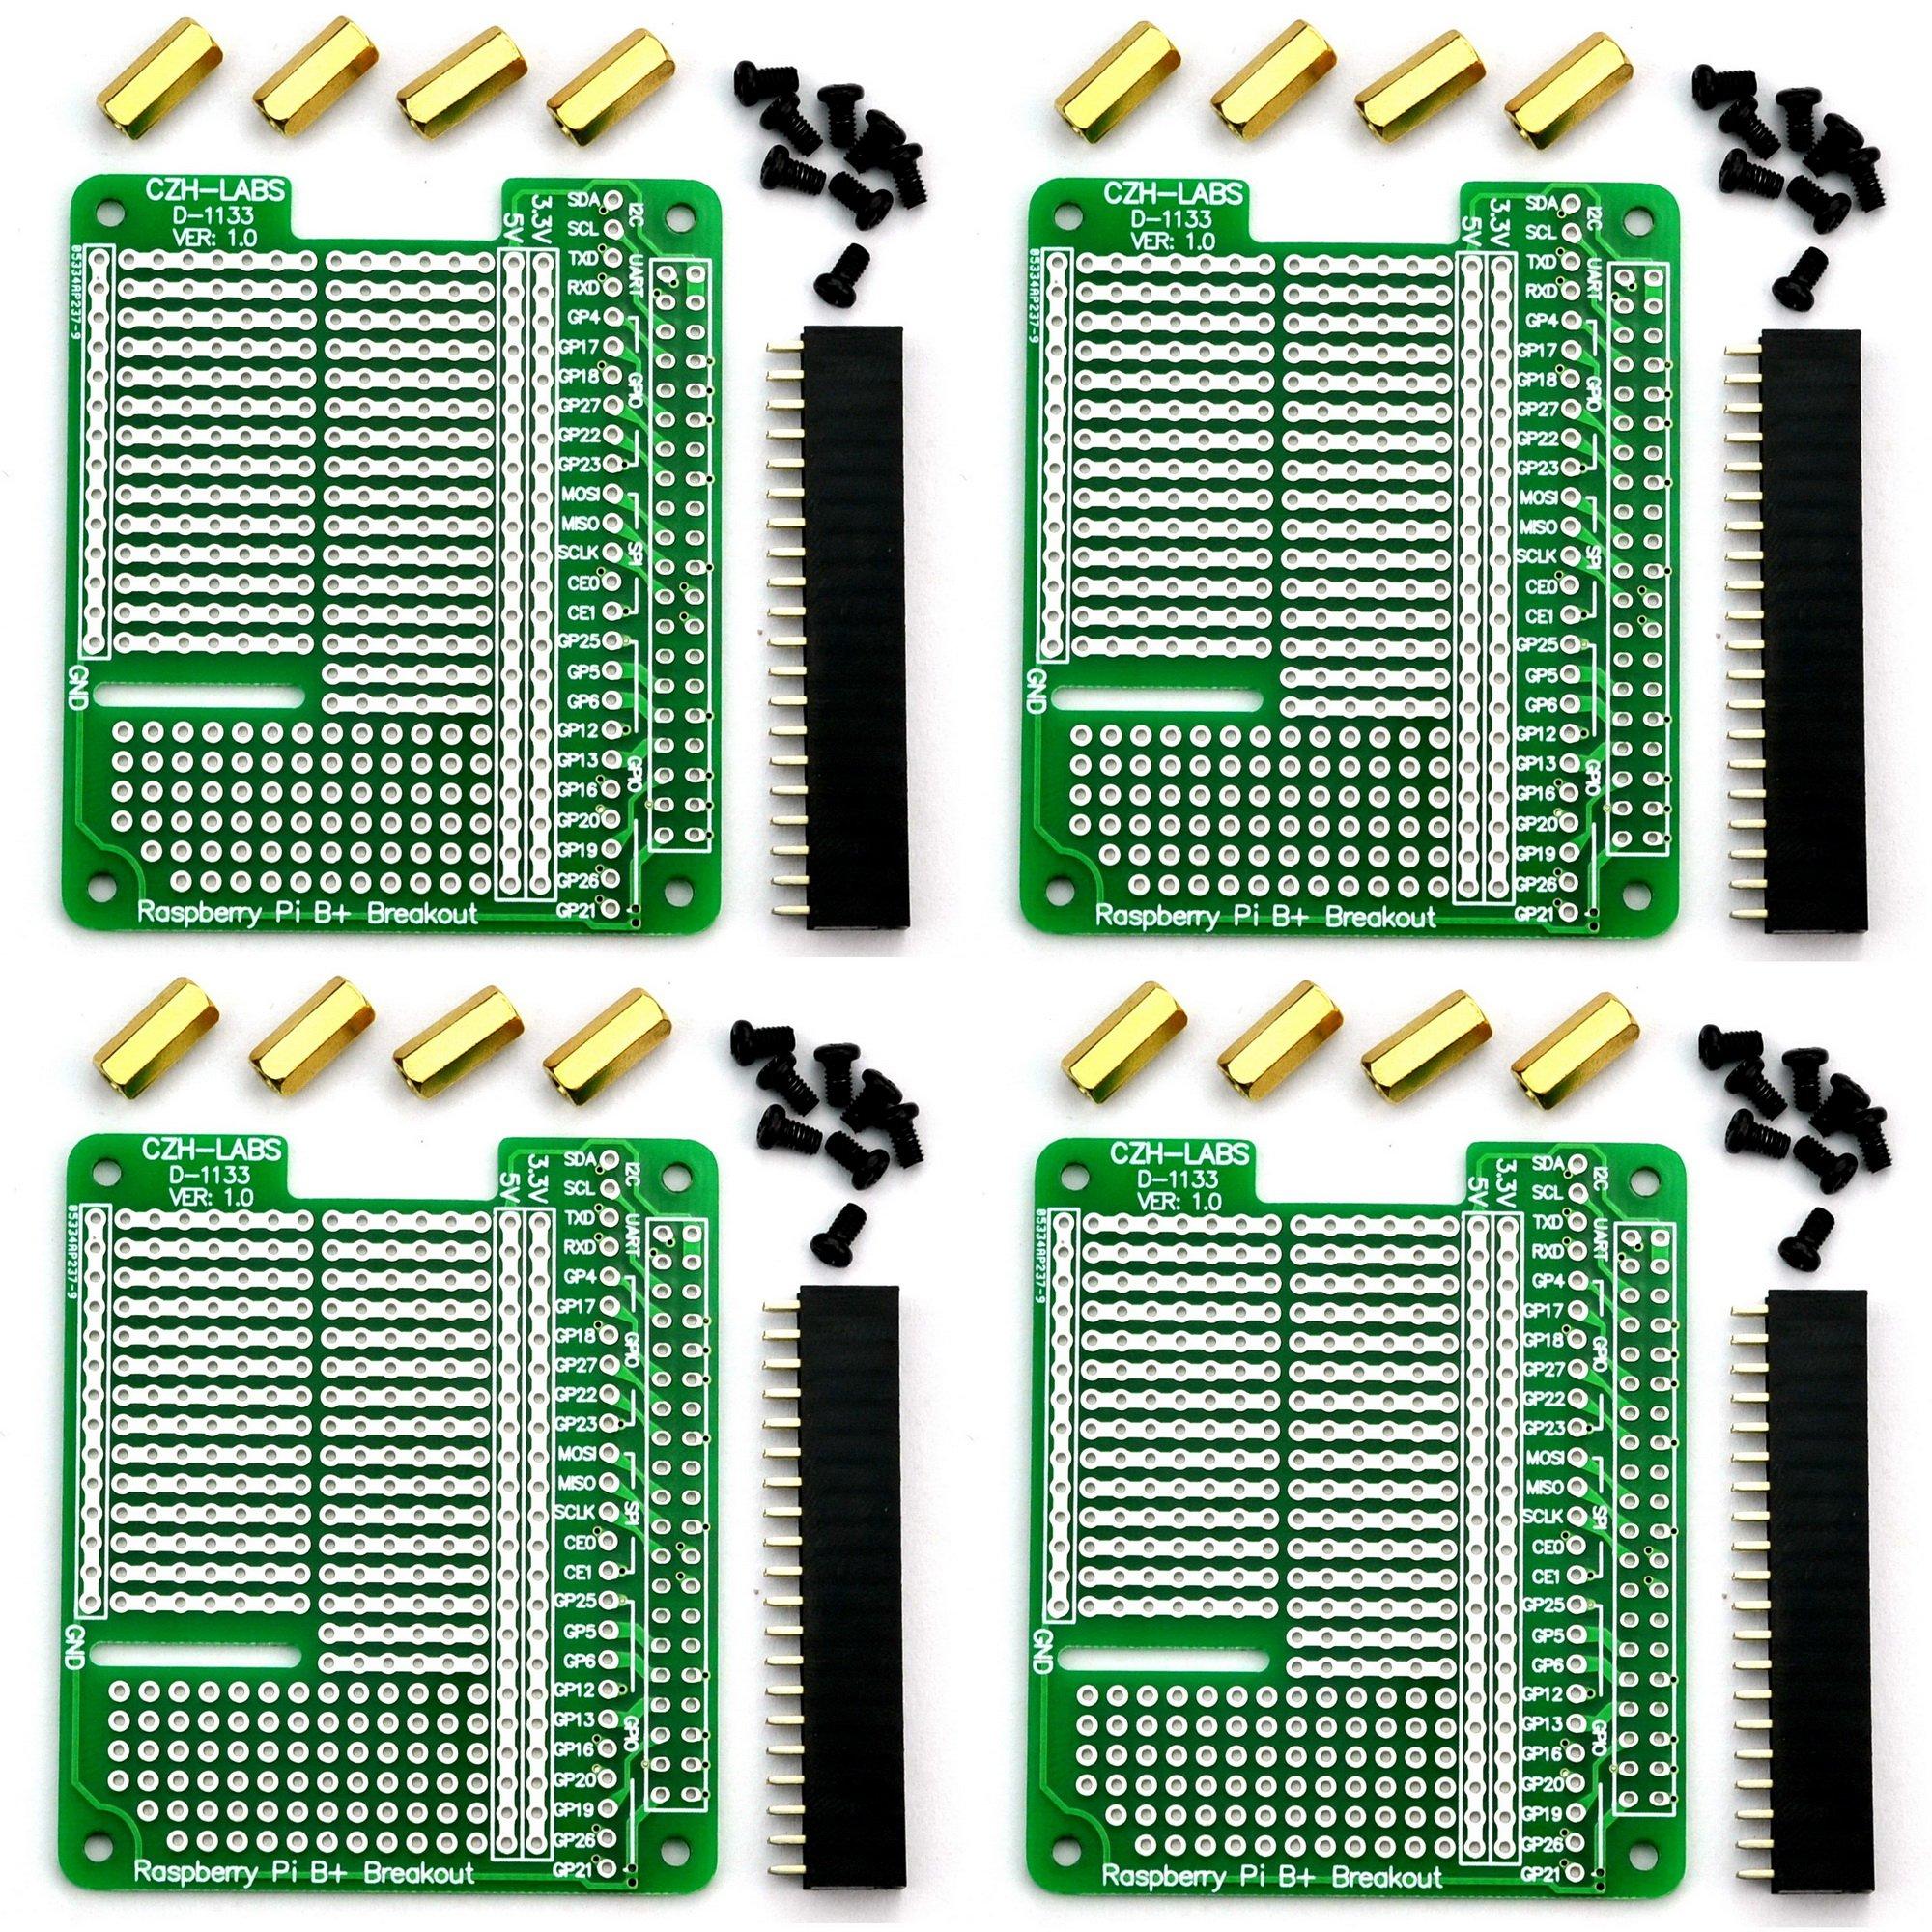 Electronics-Salon 4x Prototype Breakout PCB Shield Board Kit for Raspberry Pi 3 2 B+ A+, Breadboard DIY. by CZH-LABS